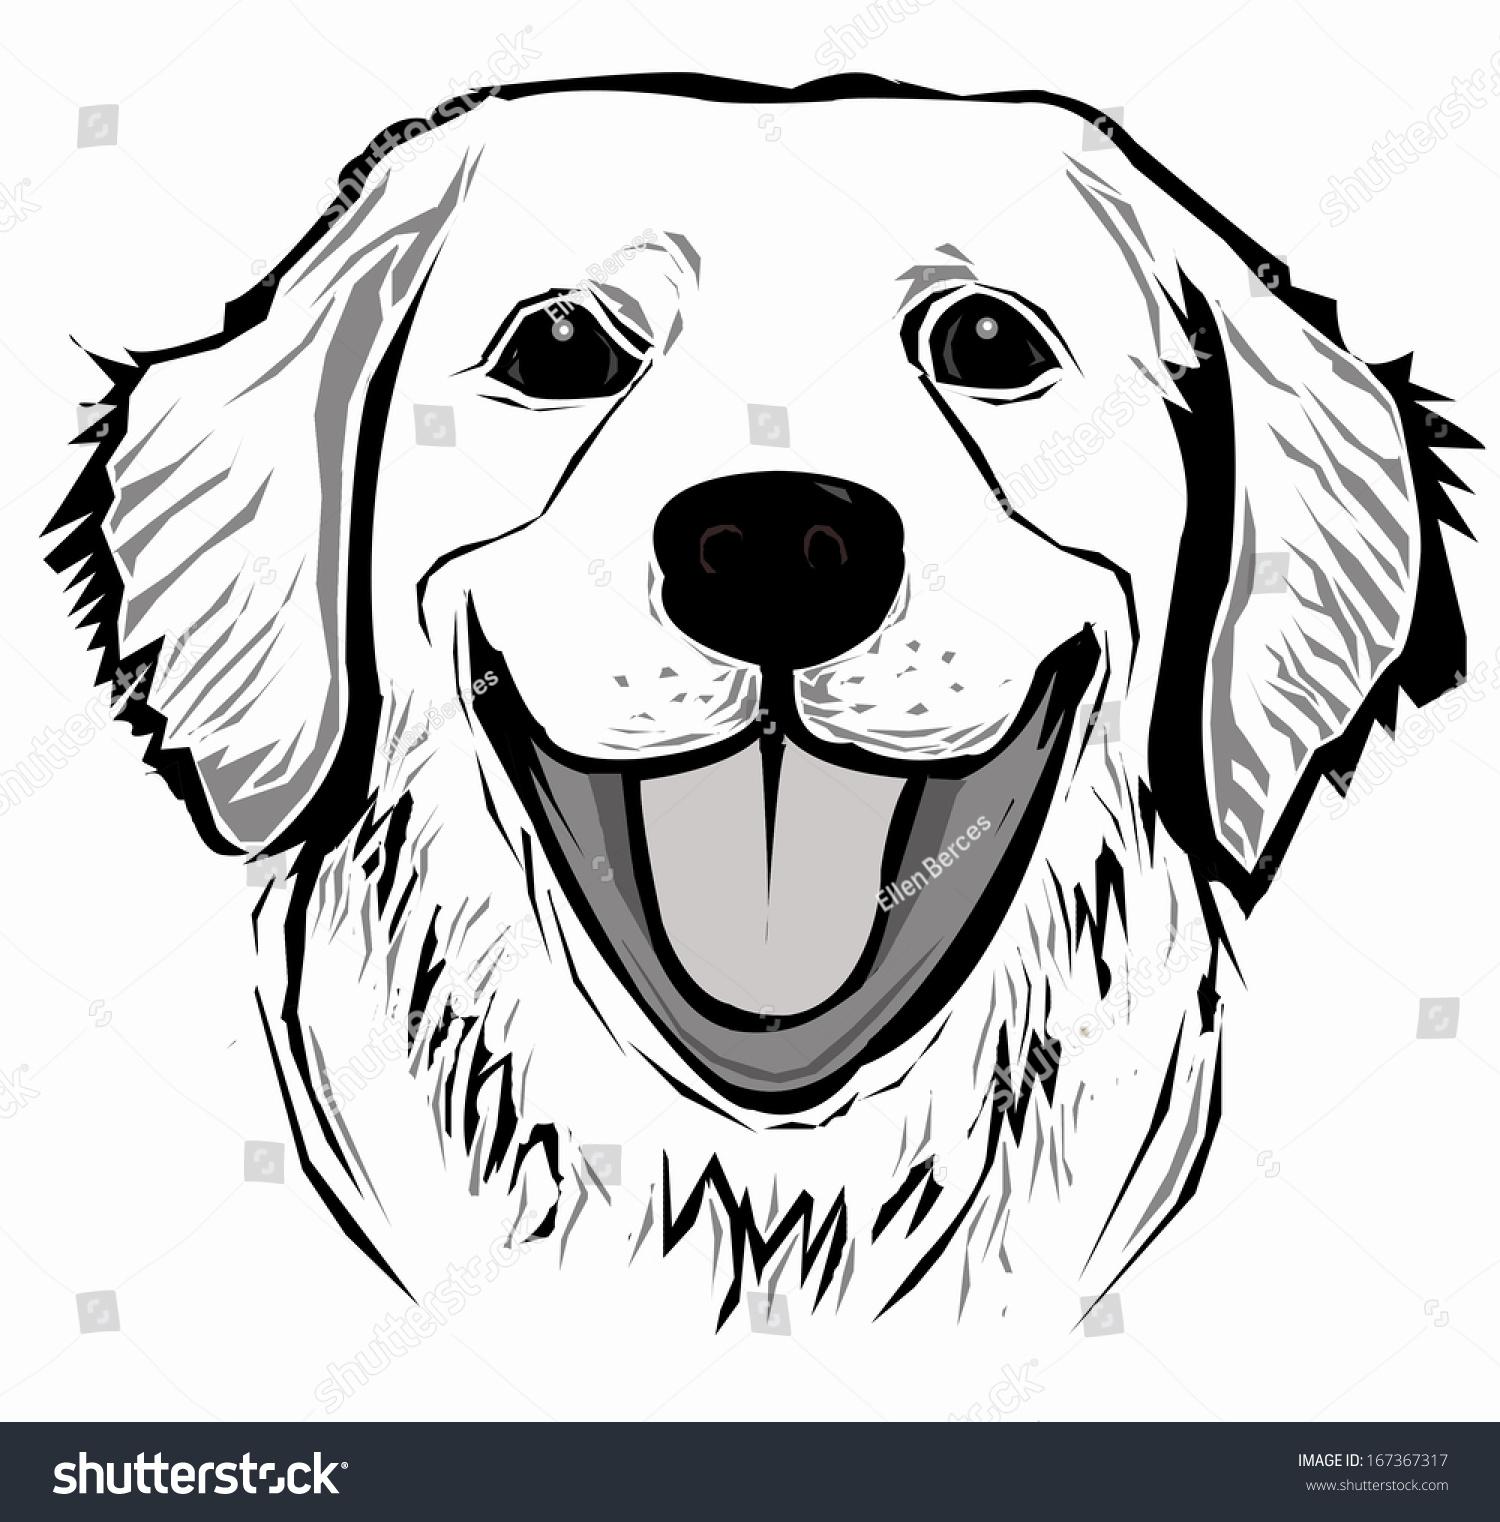 Line Drawing Of A Dog S Face : Dog face banco de ilustração vetorial shutterstock